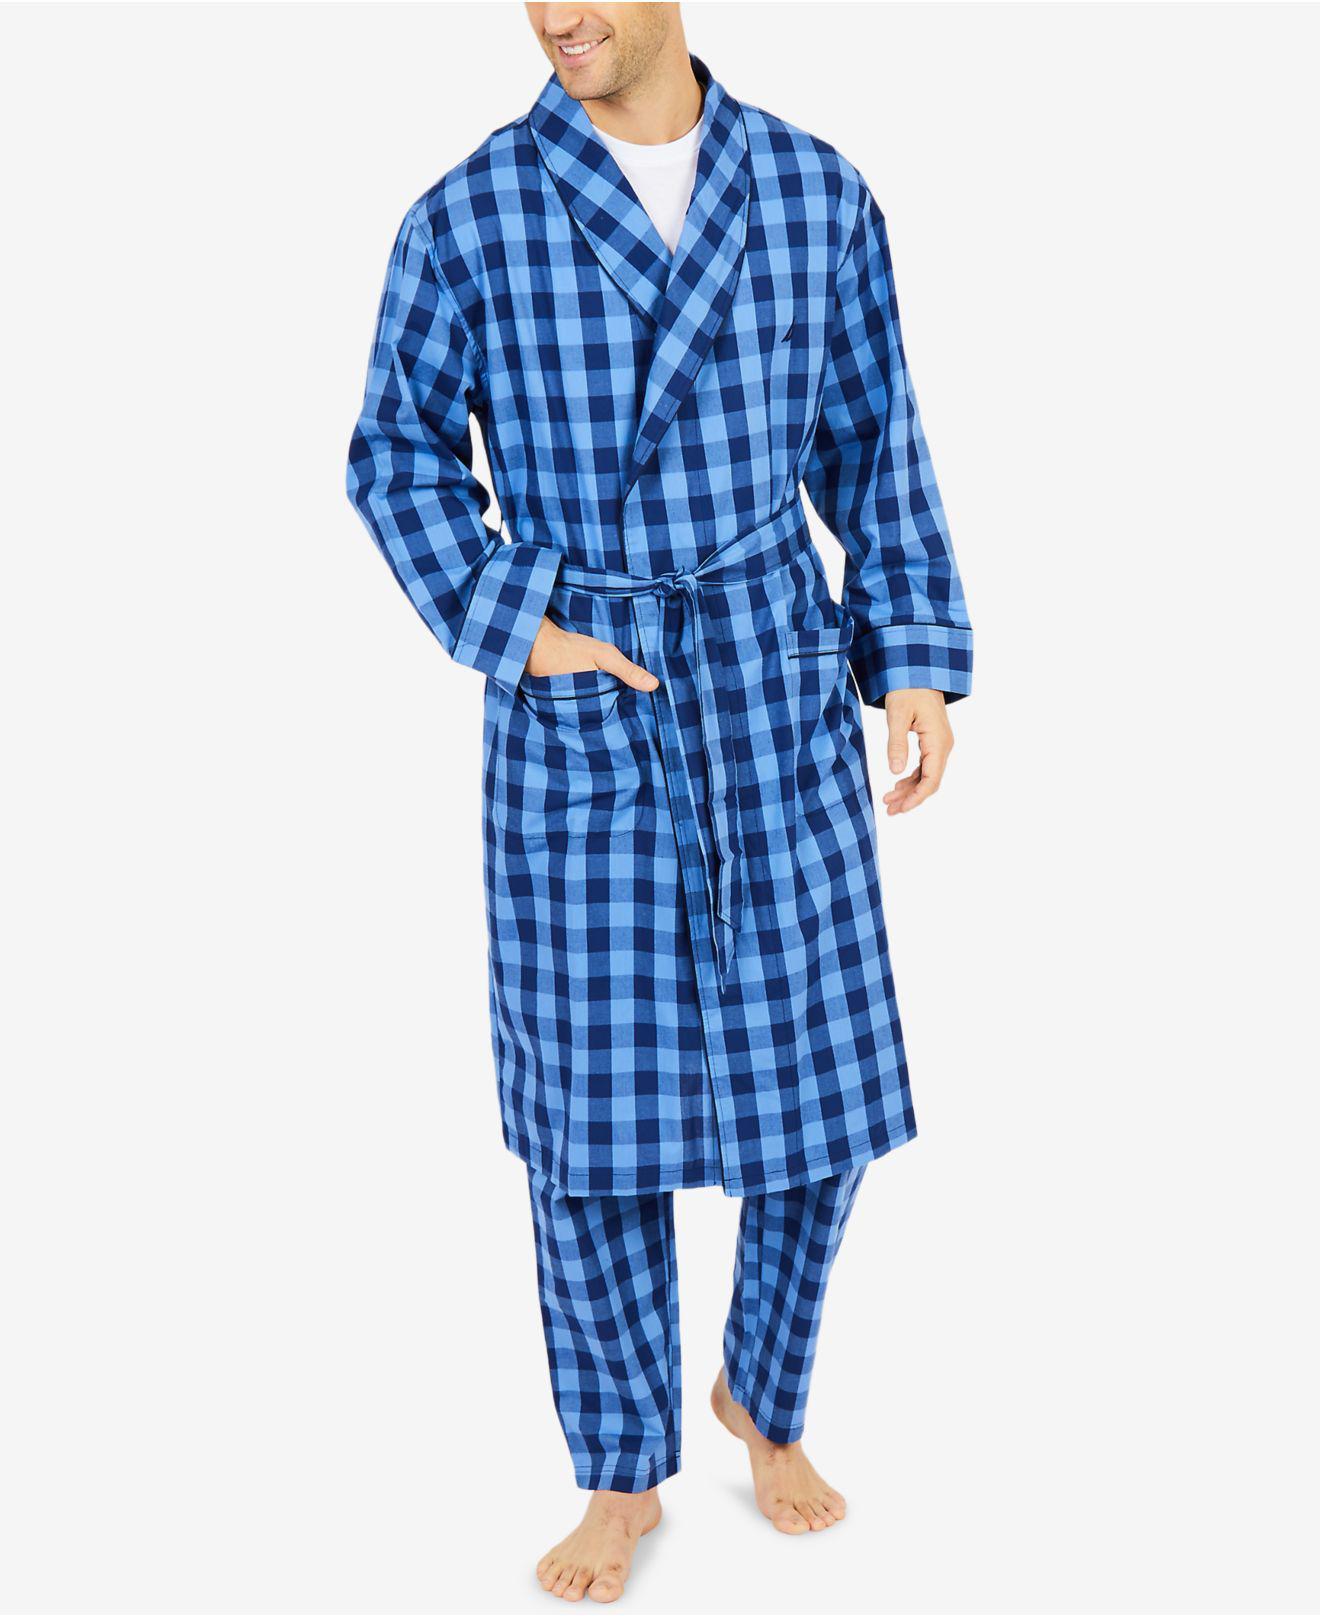 b6cb9d97a2 Lyst - Nautica Buffalo Plaid Shawl-collar Cotton Robe in Blue for Men